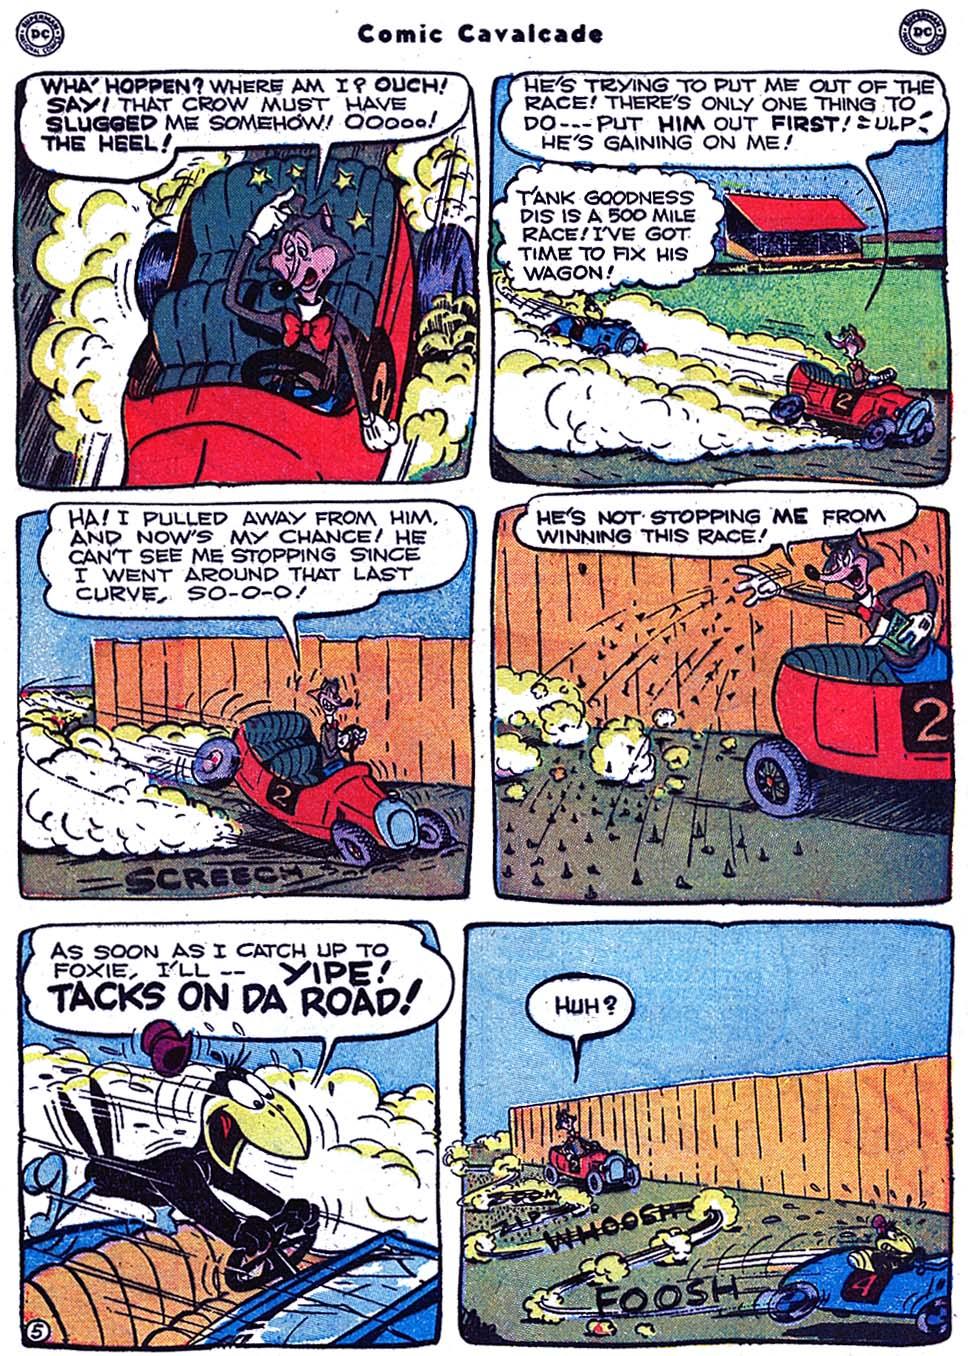 Comic Cavalcade issue 38 - Page 7